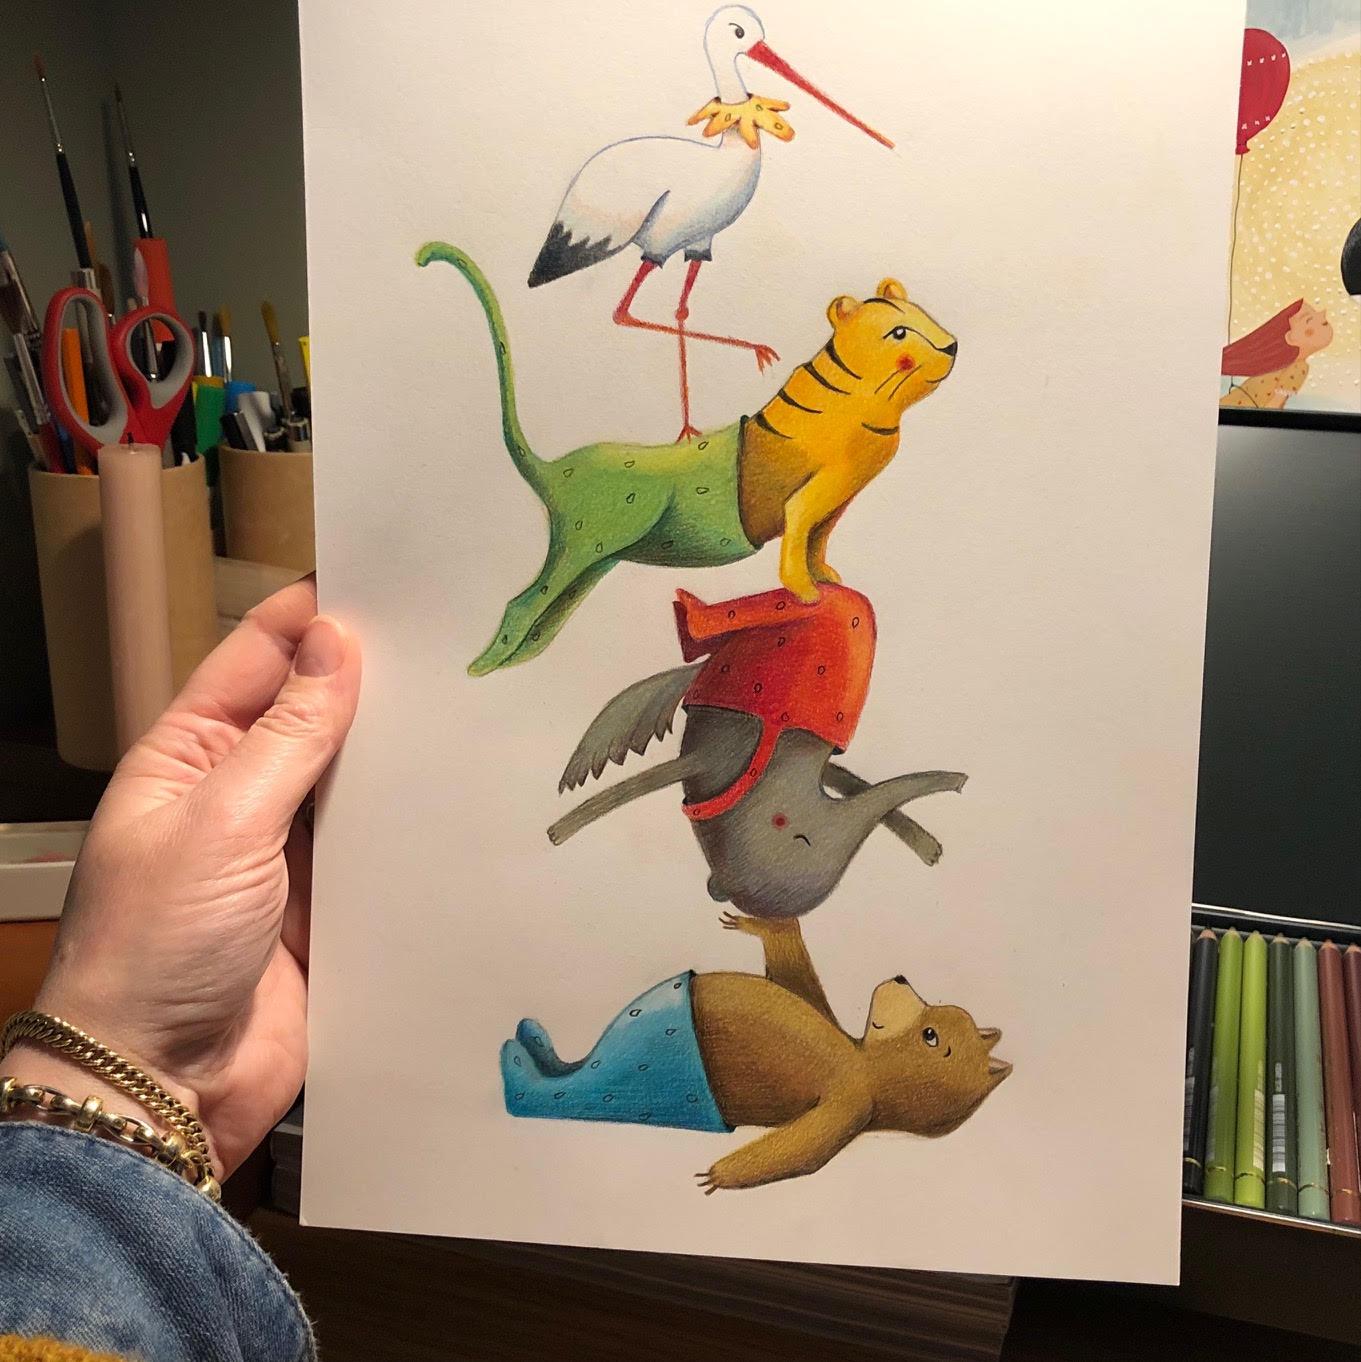 potlood tekening circus dieren - kinderkamervintage